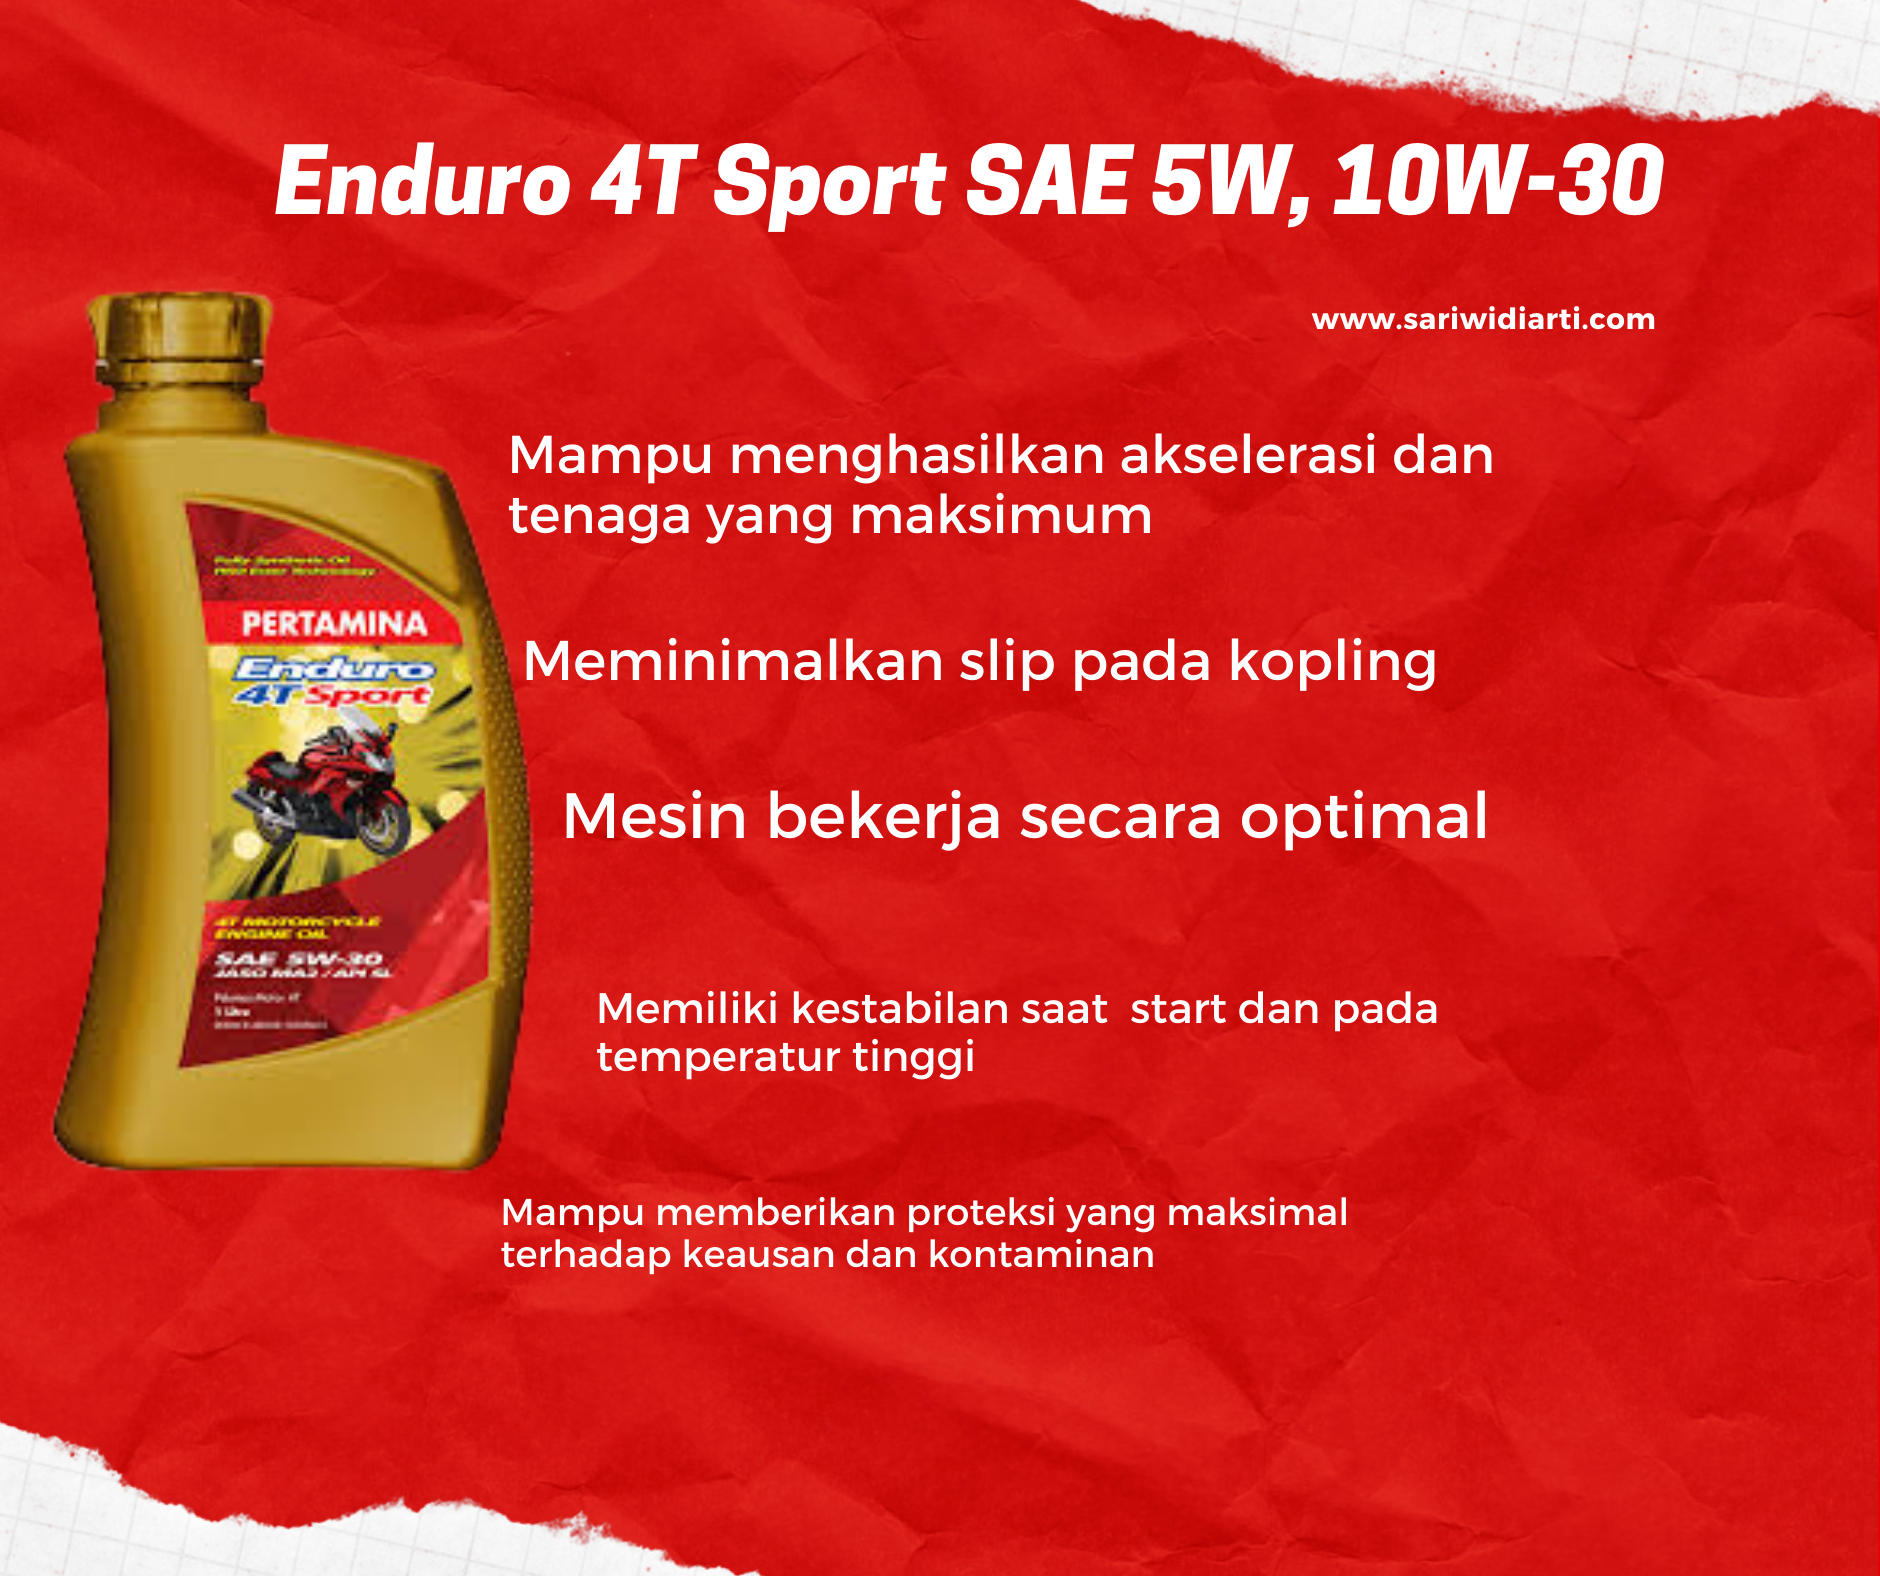 Enduro 4T Sport SAE 5W, 10W-30